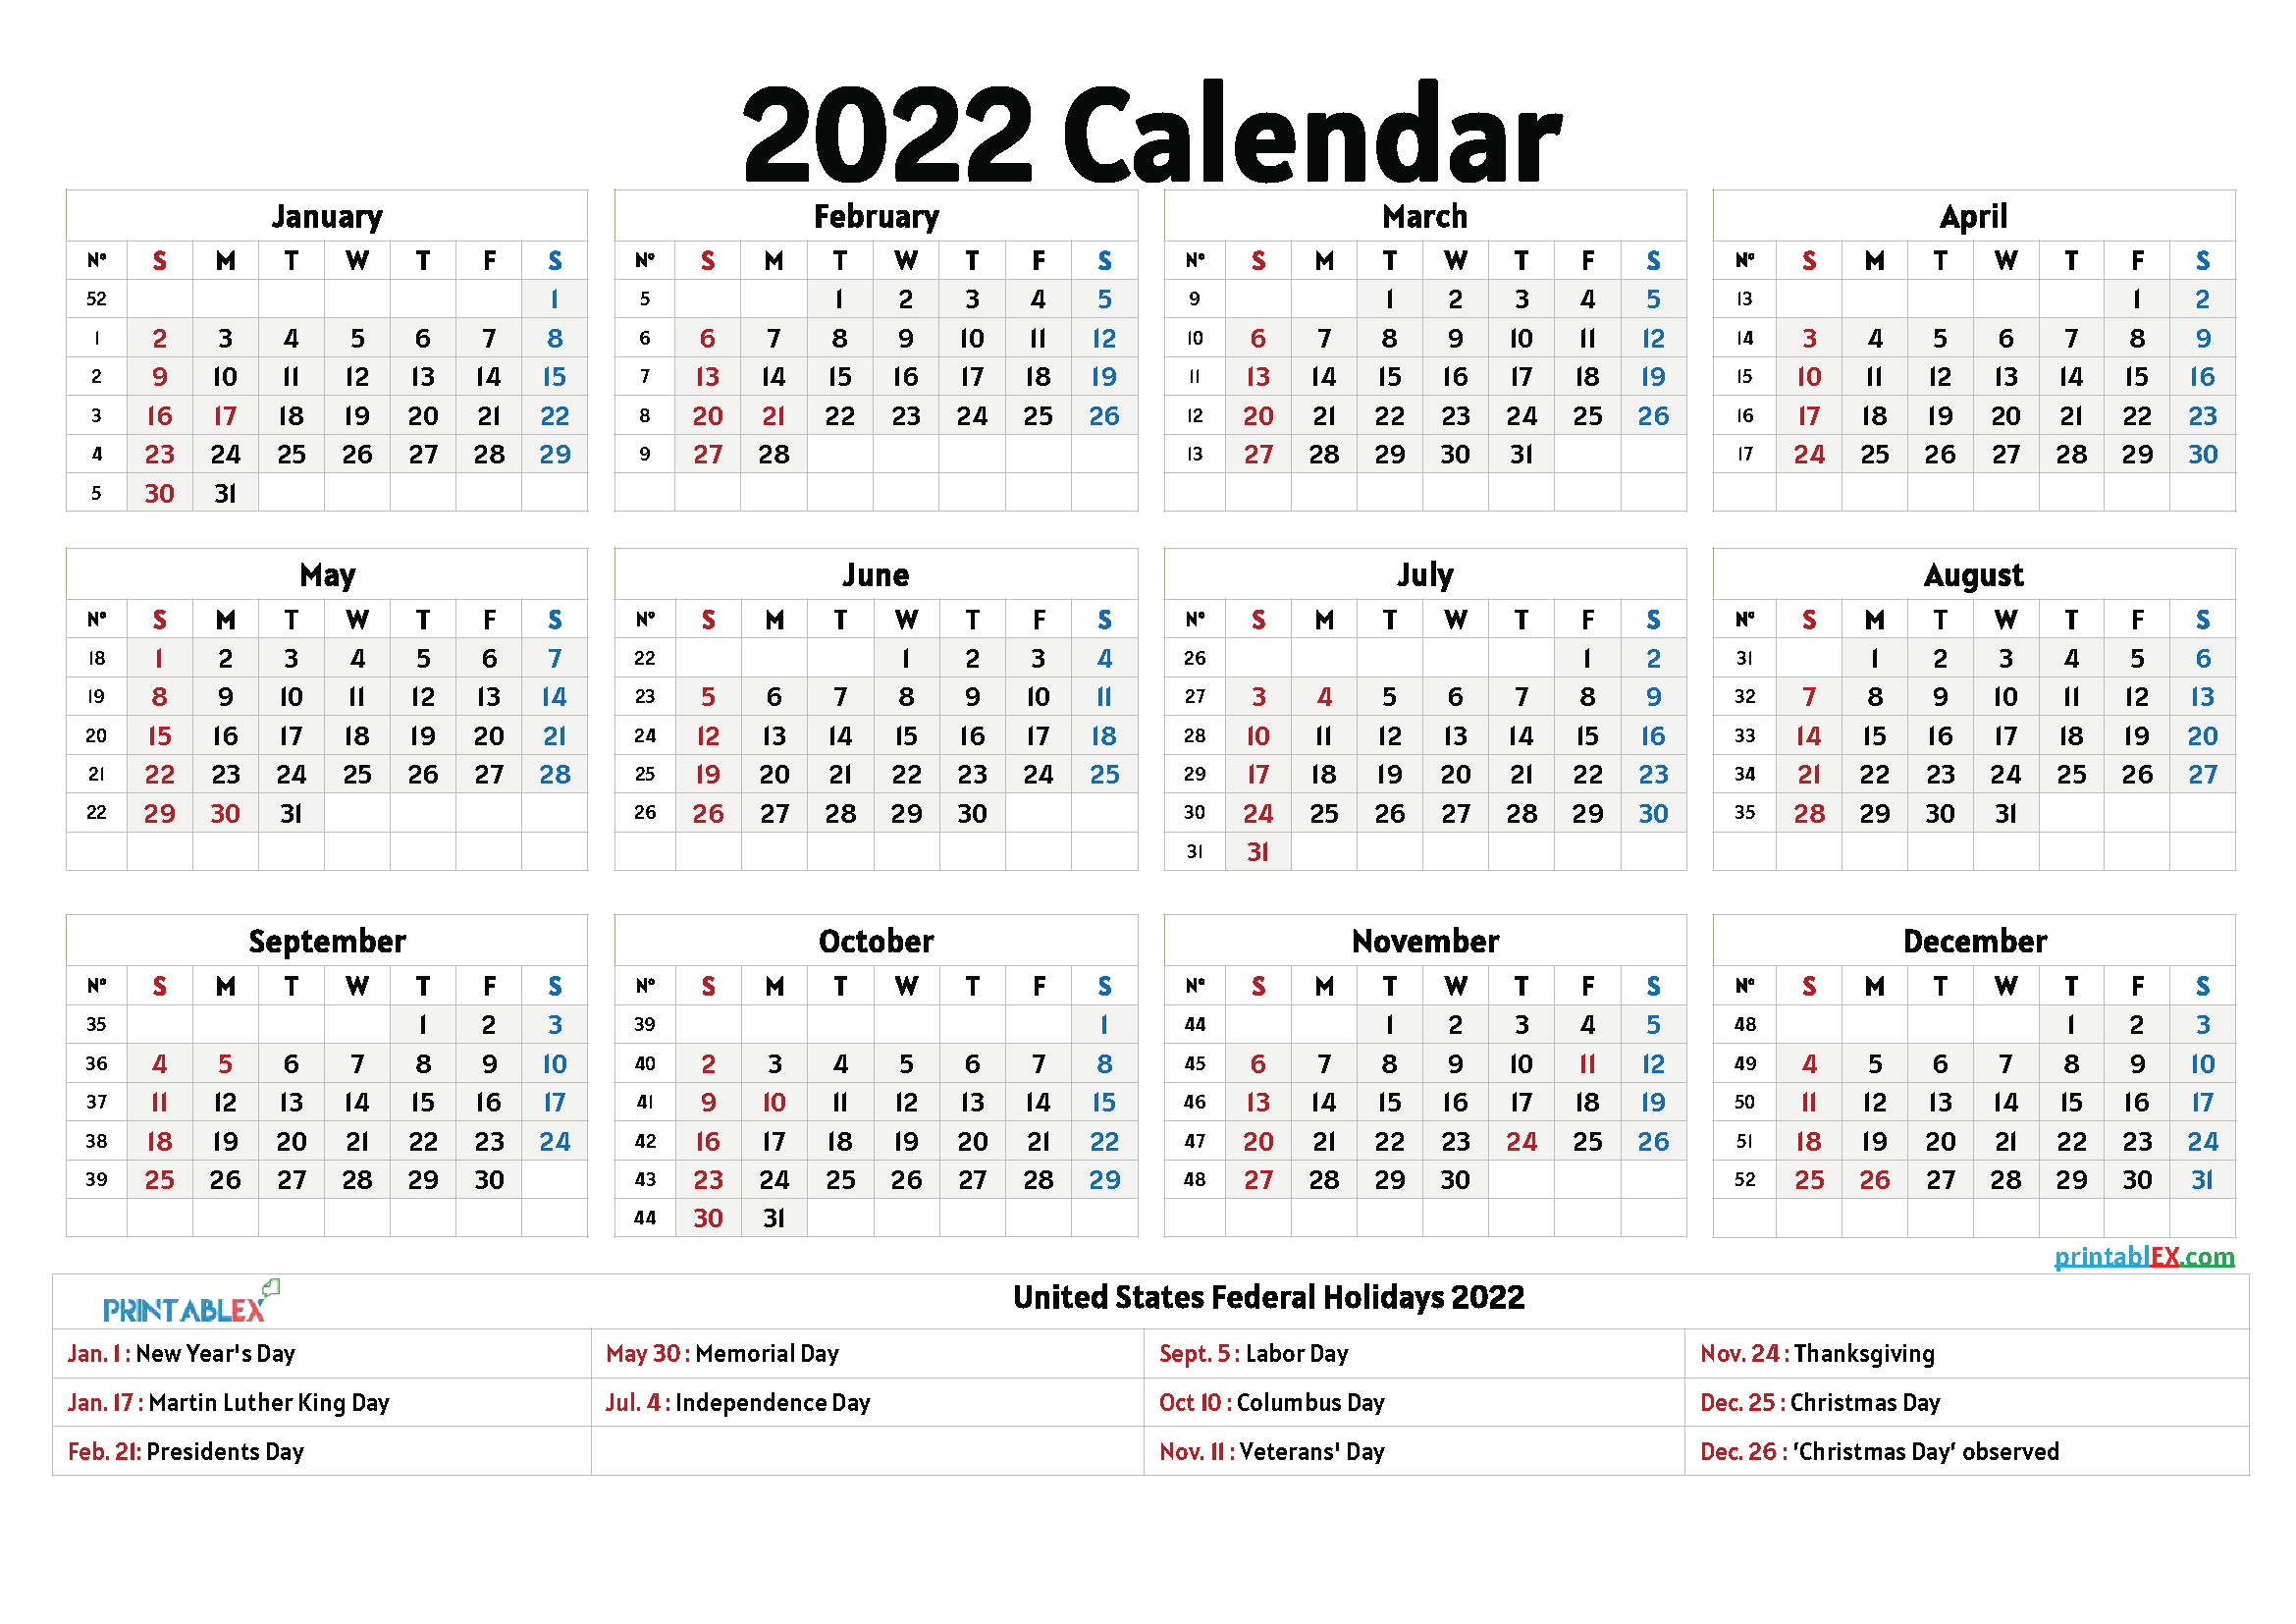 Connections Academy 2021 2022 Calendar   Calendar 2021 regarding 2022 Printable Julian Date Calendar